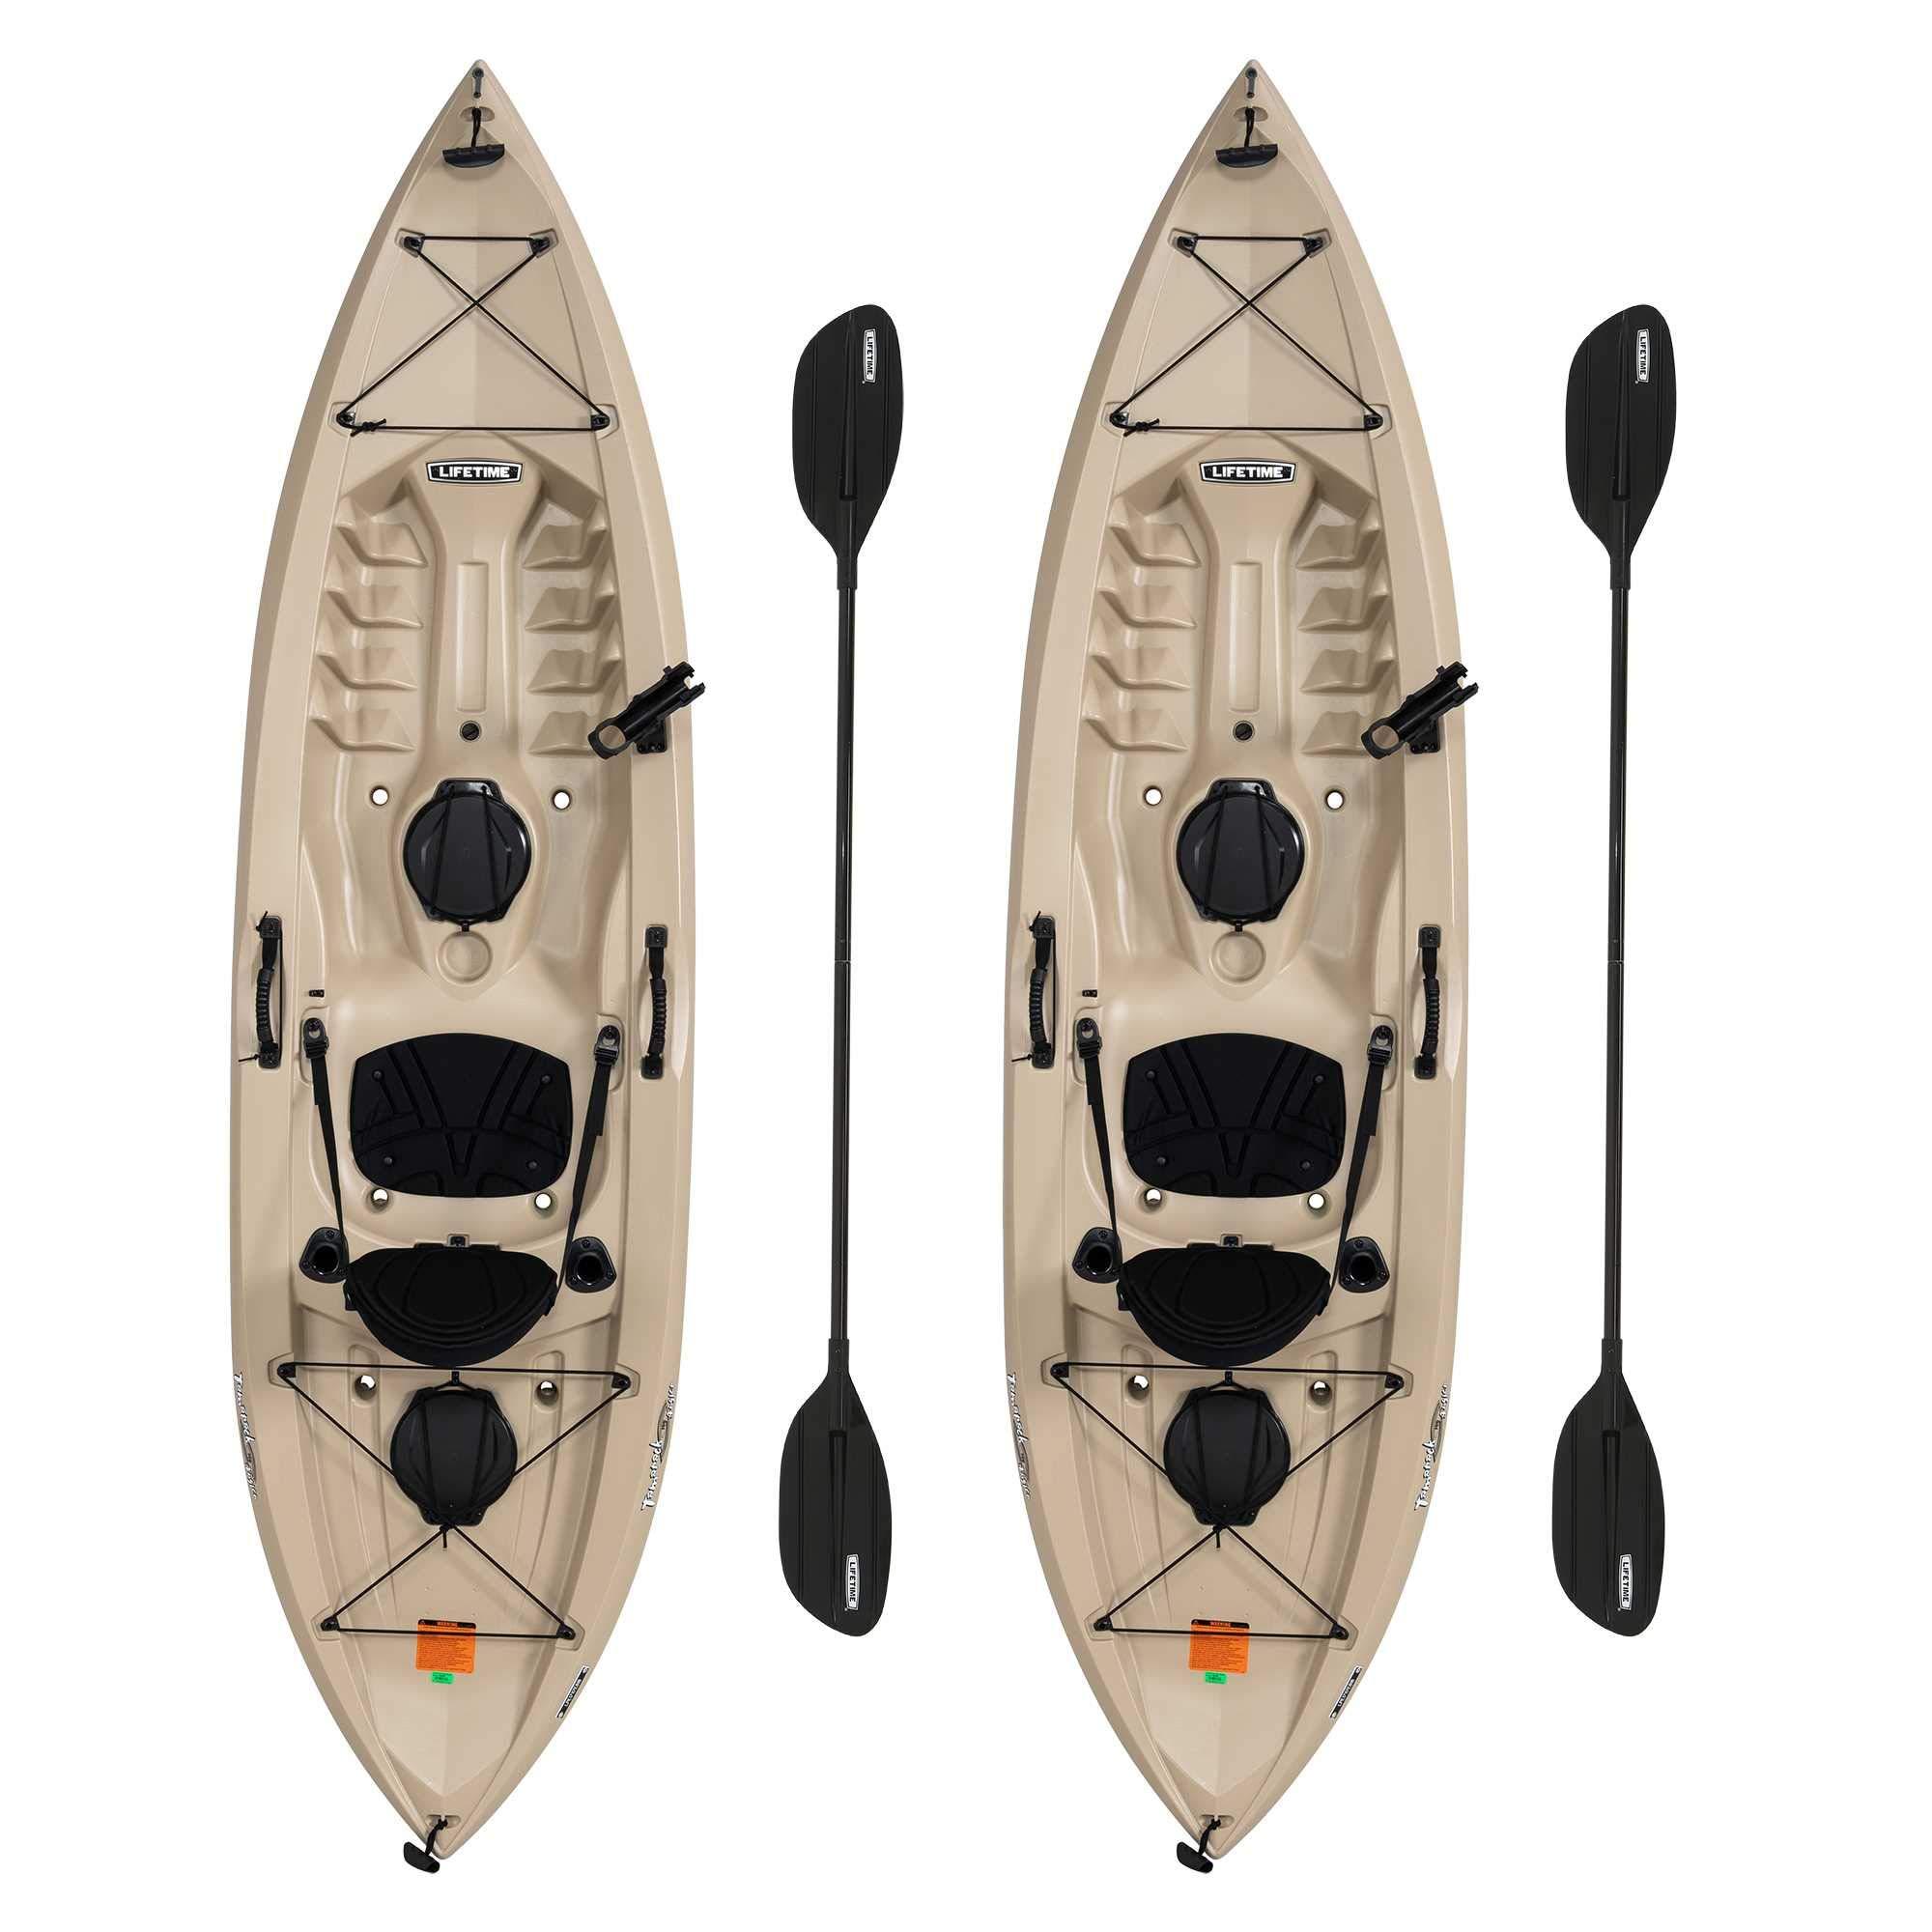 Lifetime 90806 Tamarack Angler 100 Fishing Kayak - 2 Pack (Paddles Included) by Lifetime